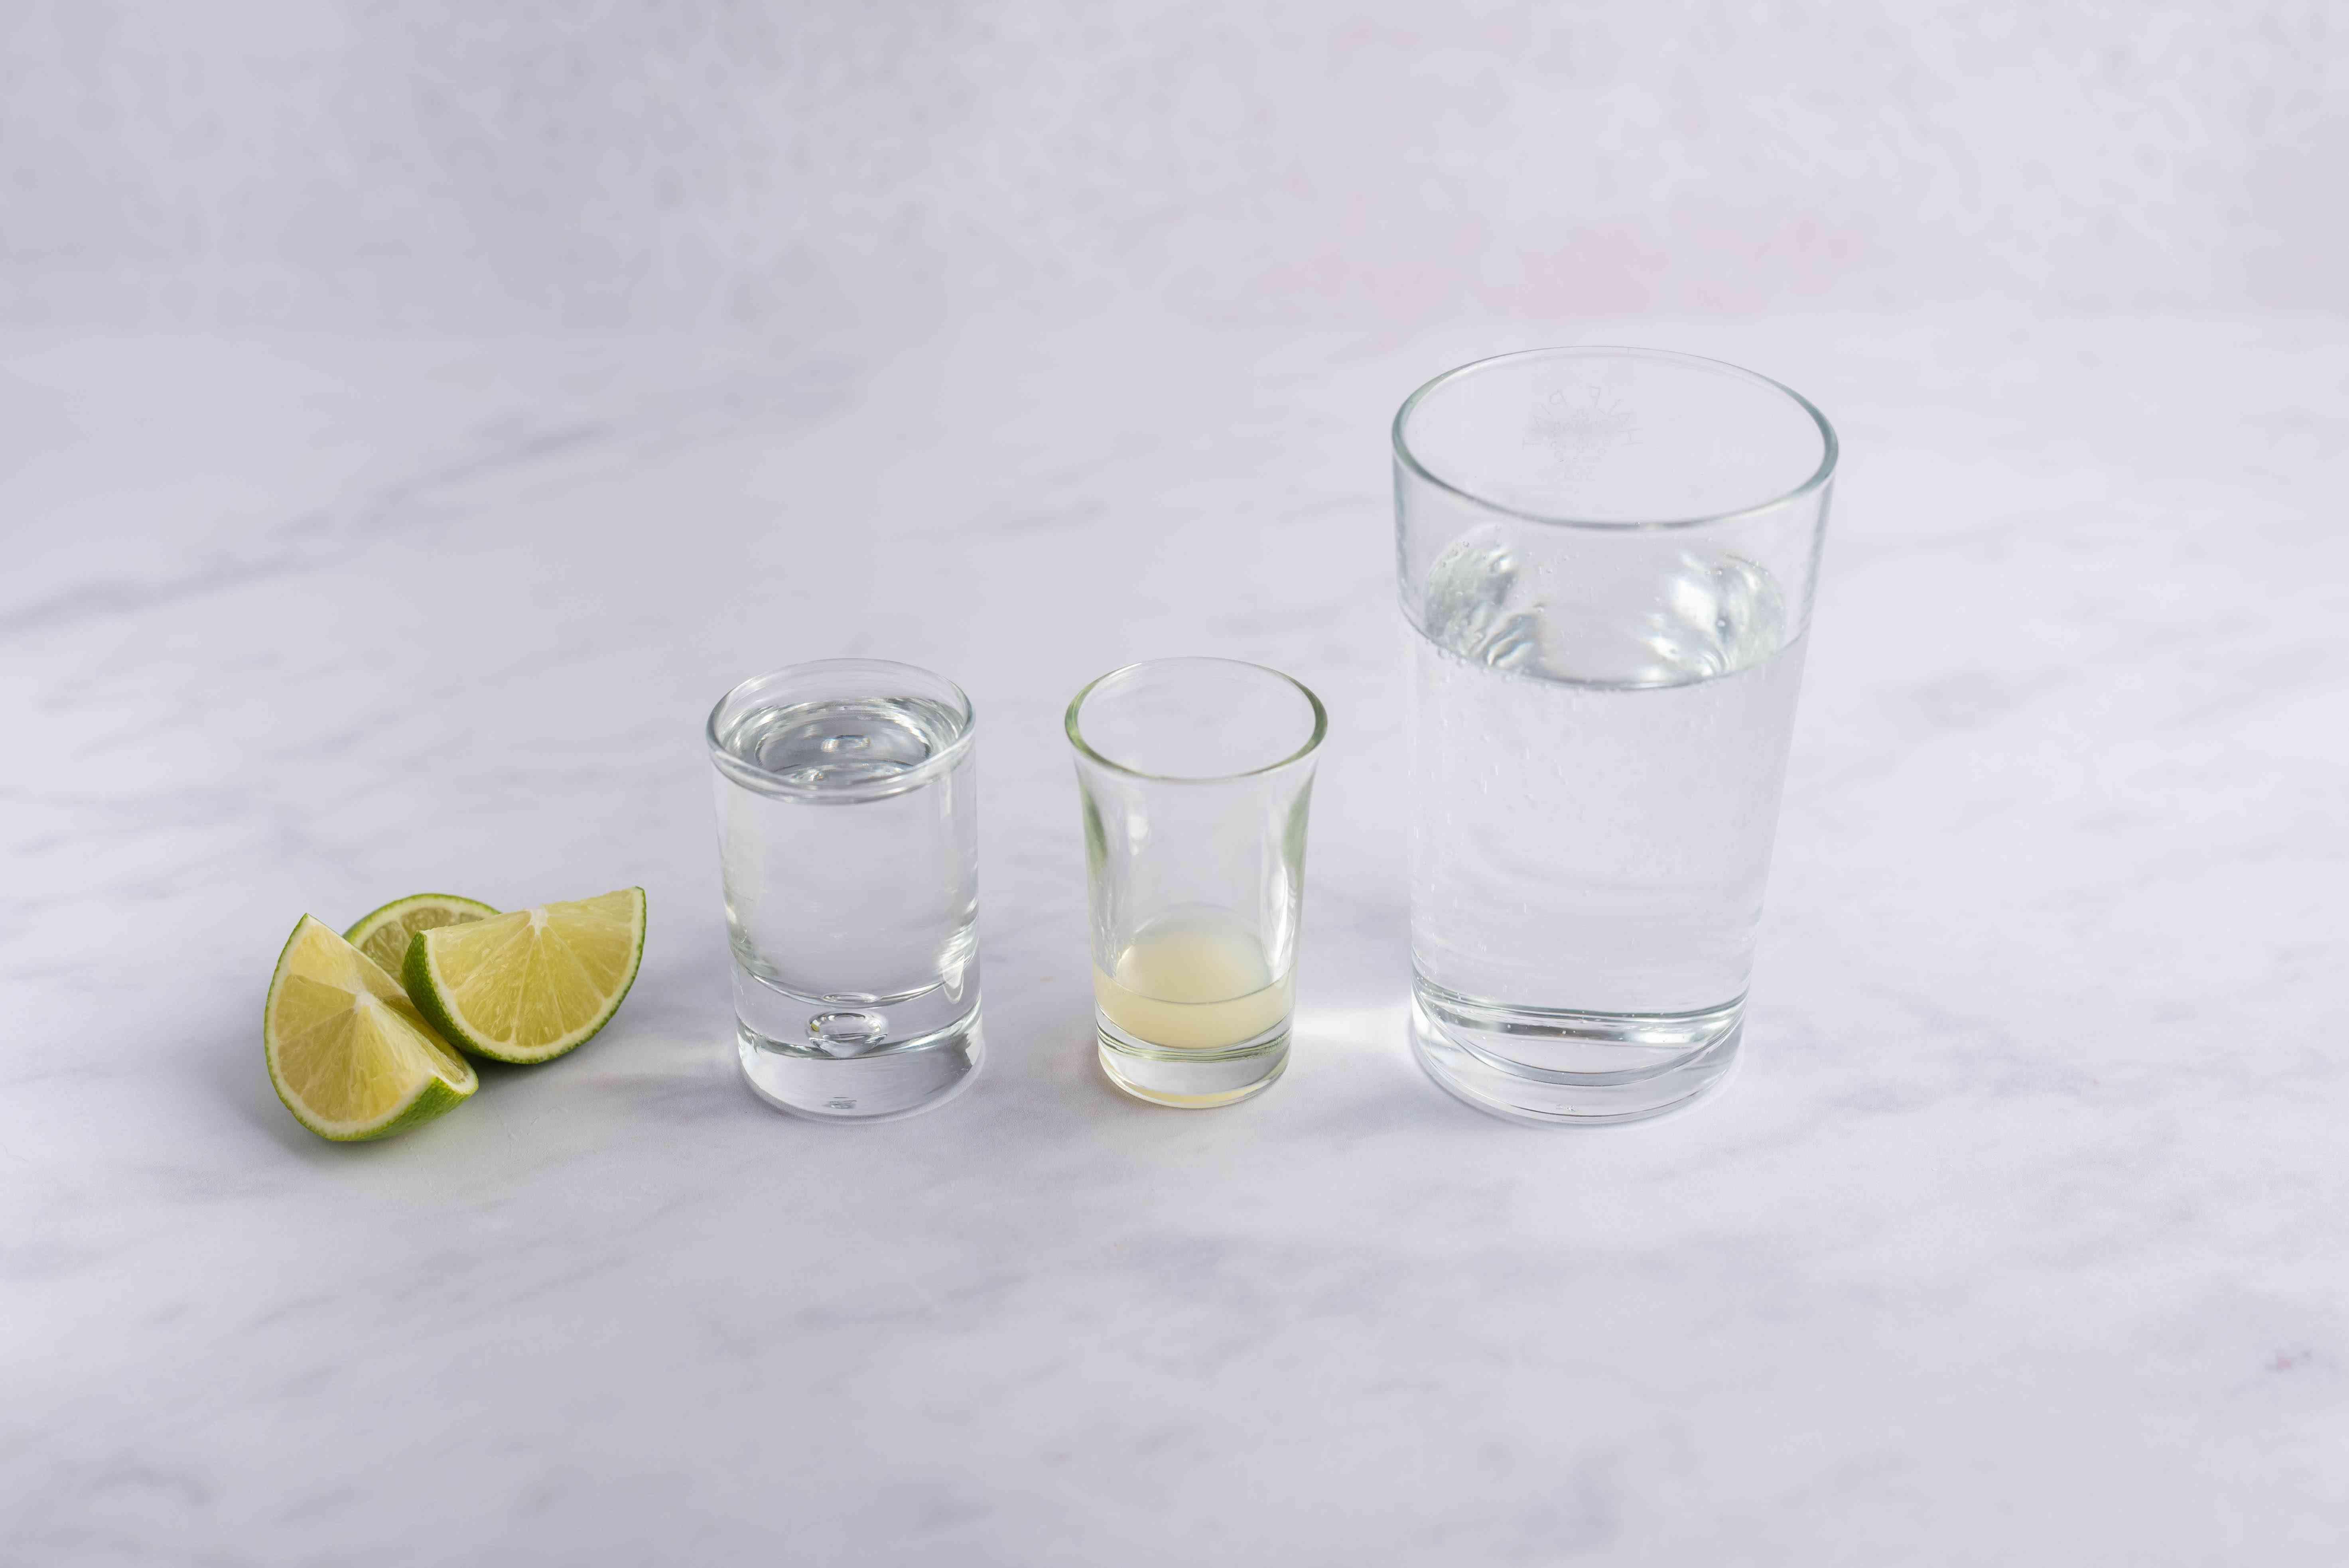 Ingredients for vodka tonic